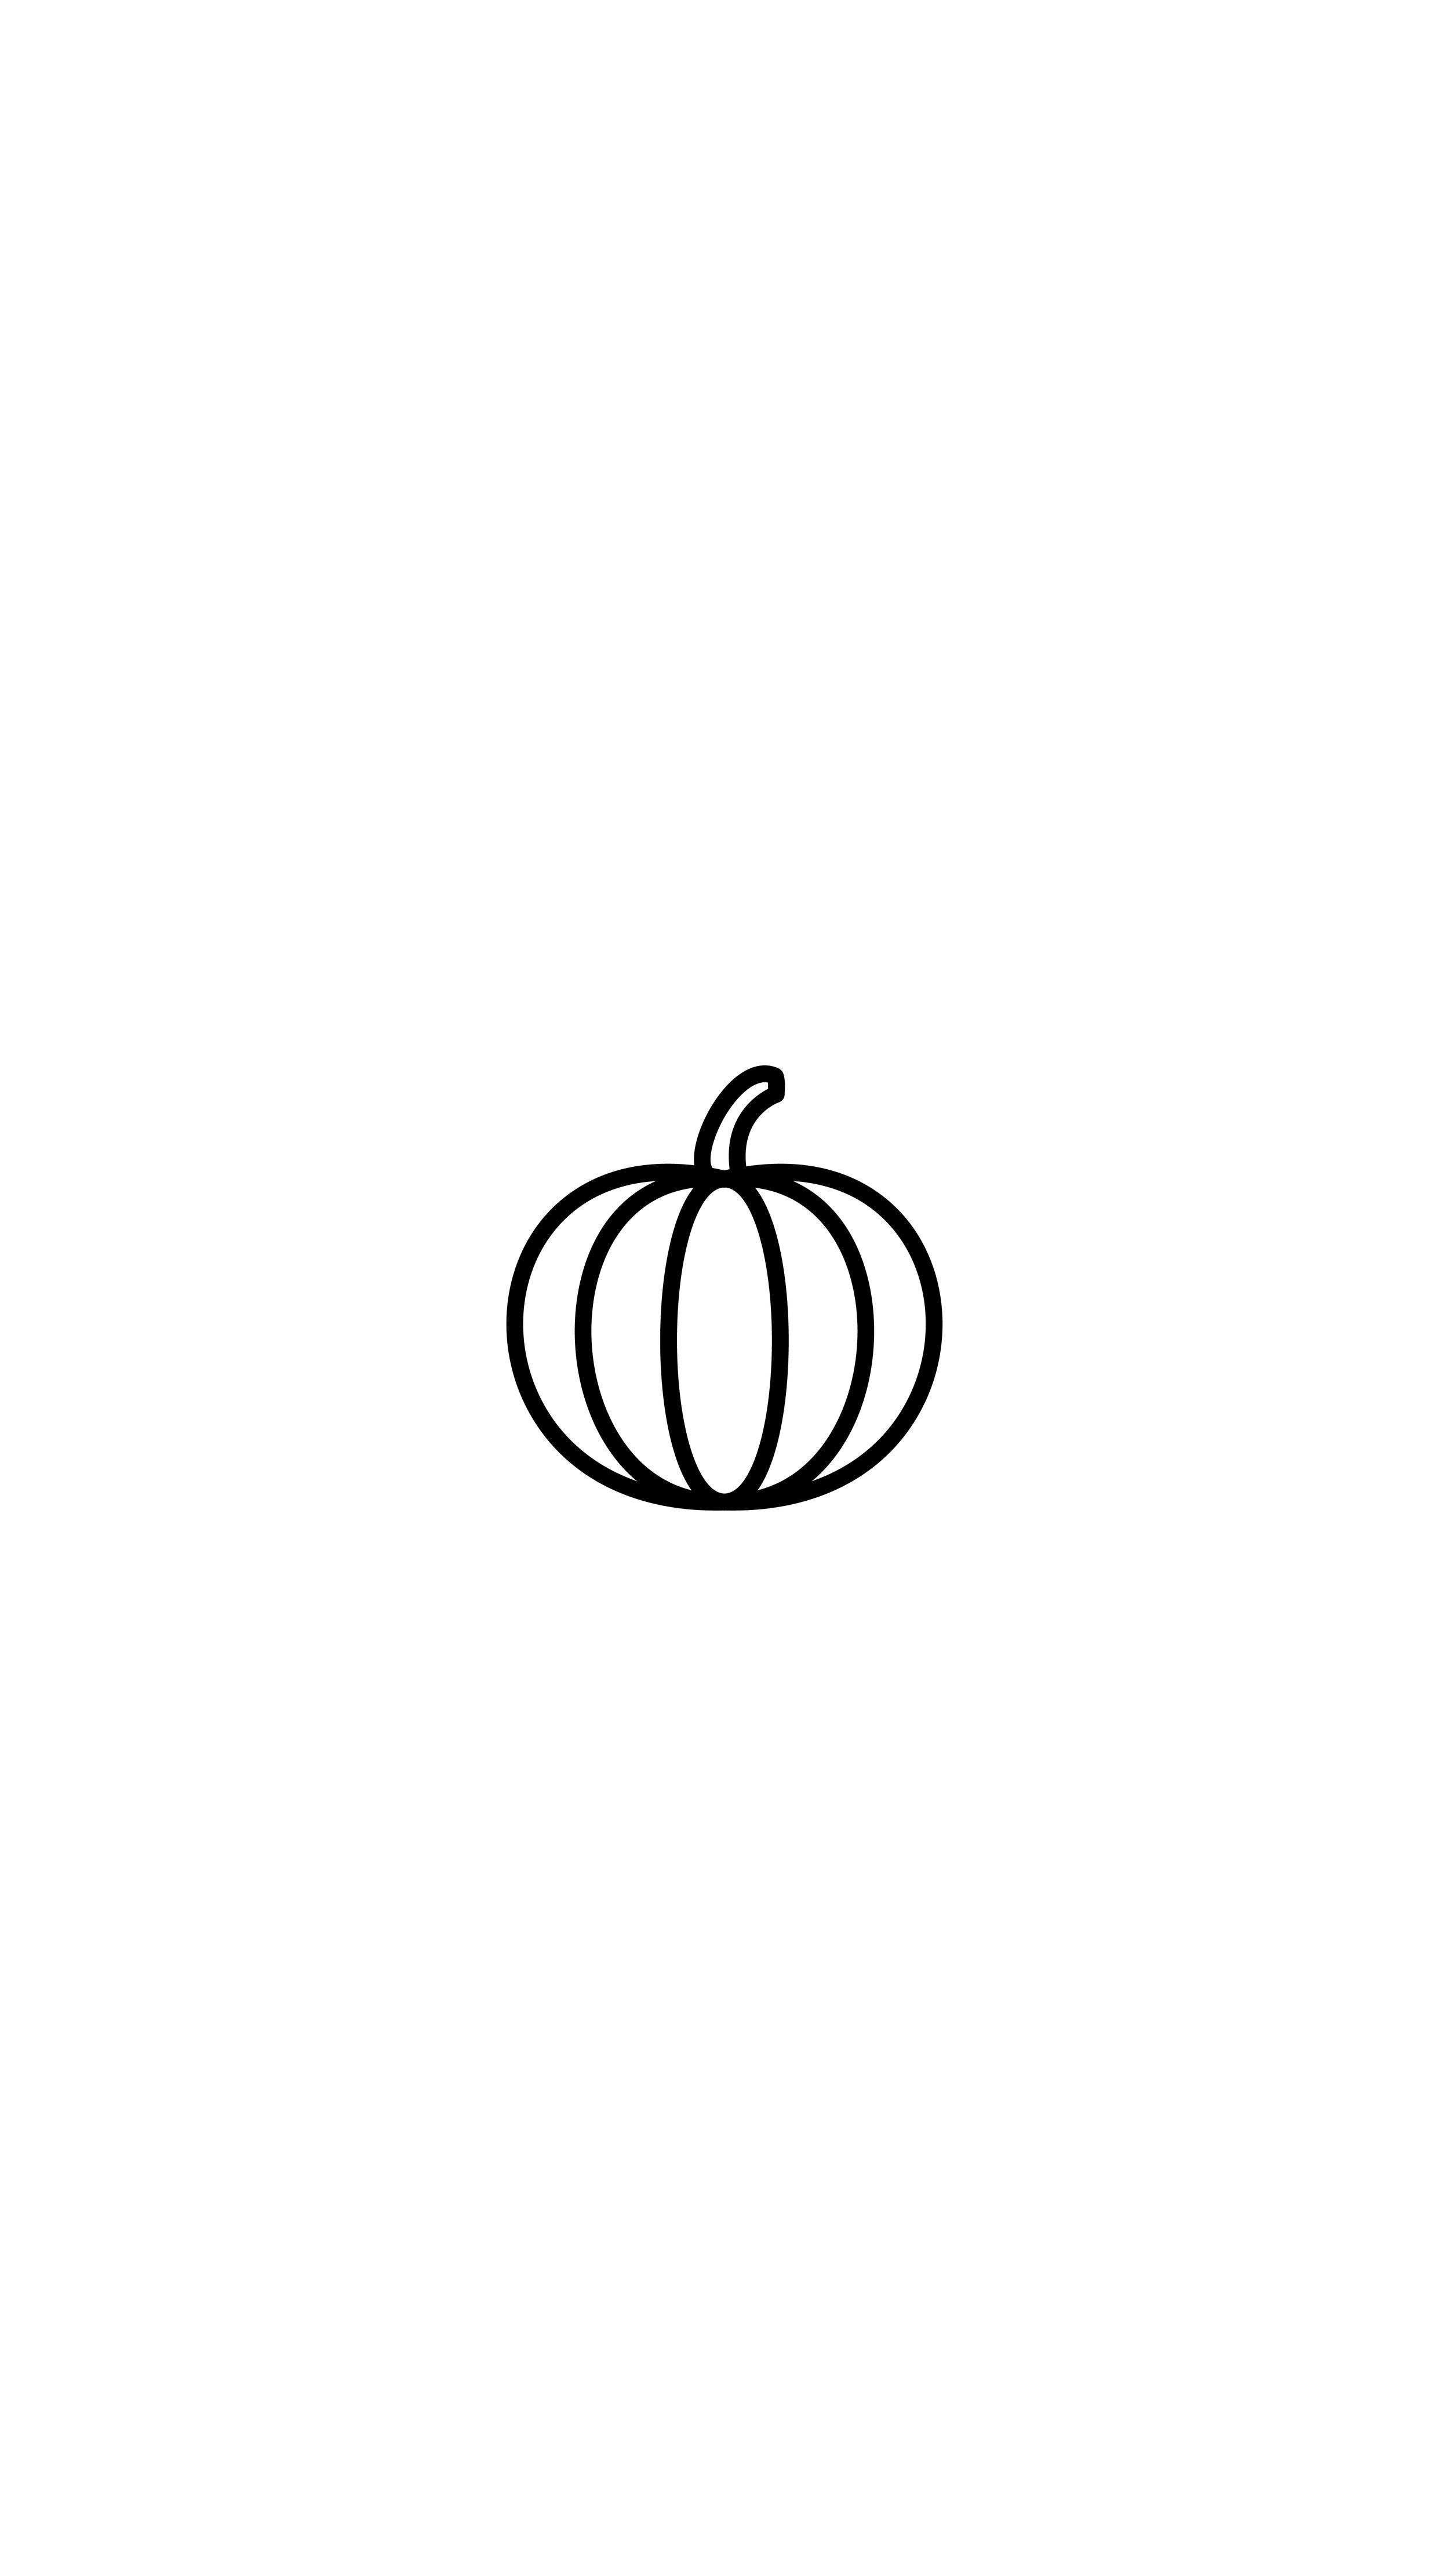 Fall, Pumpkin, Autumn